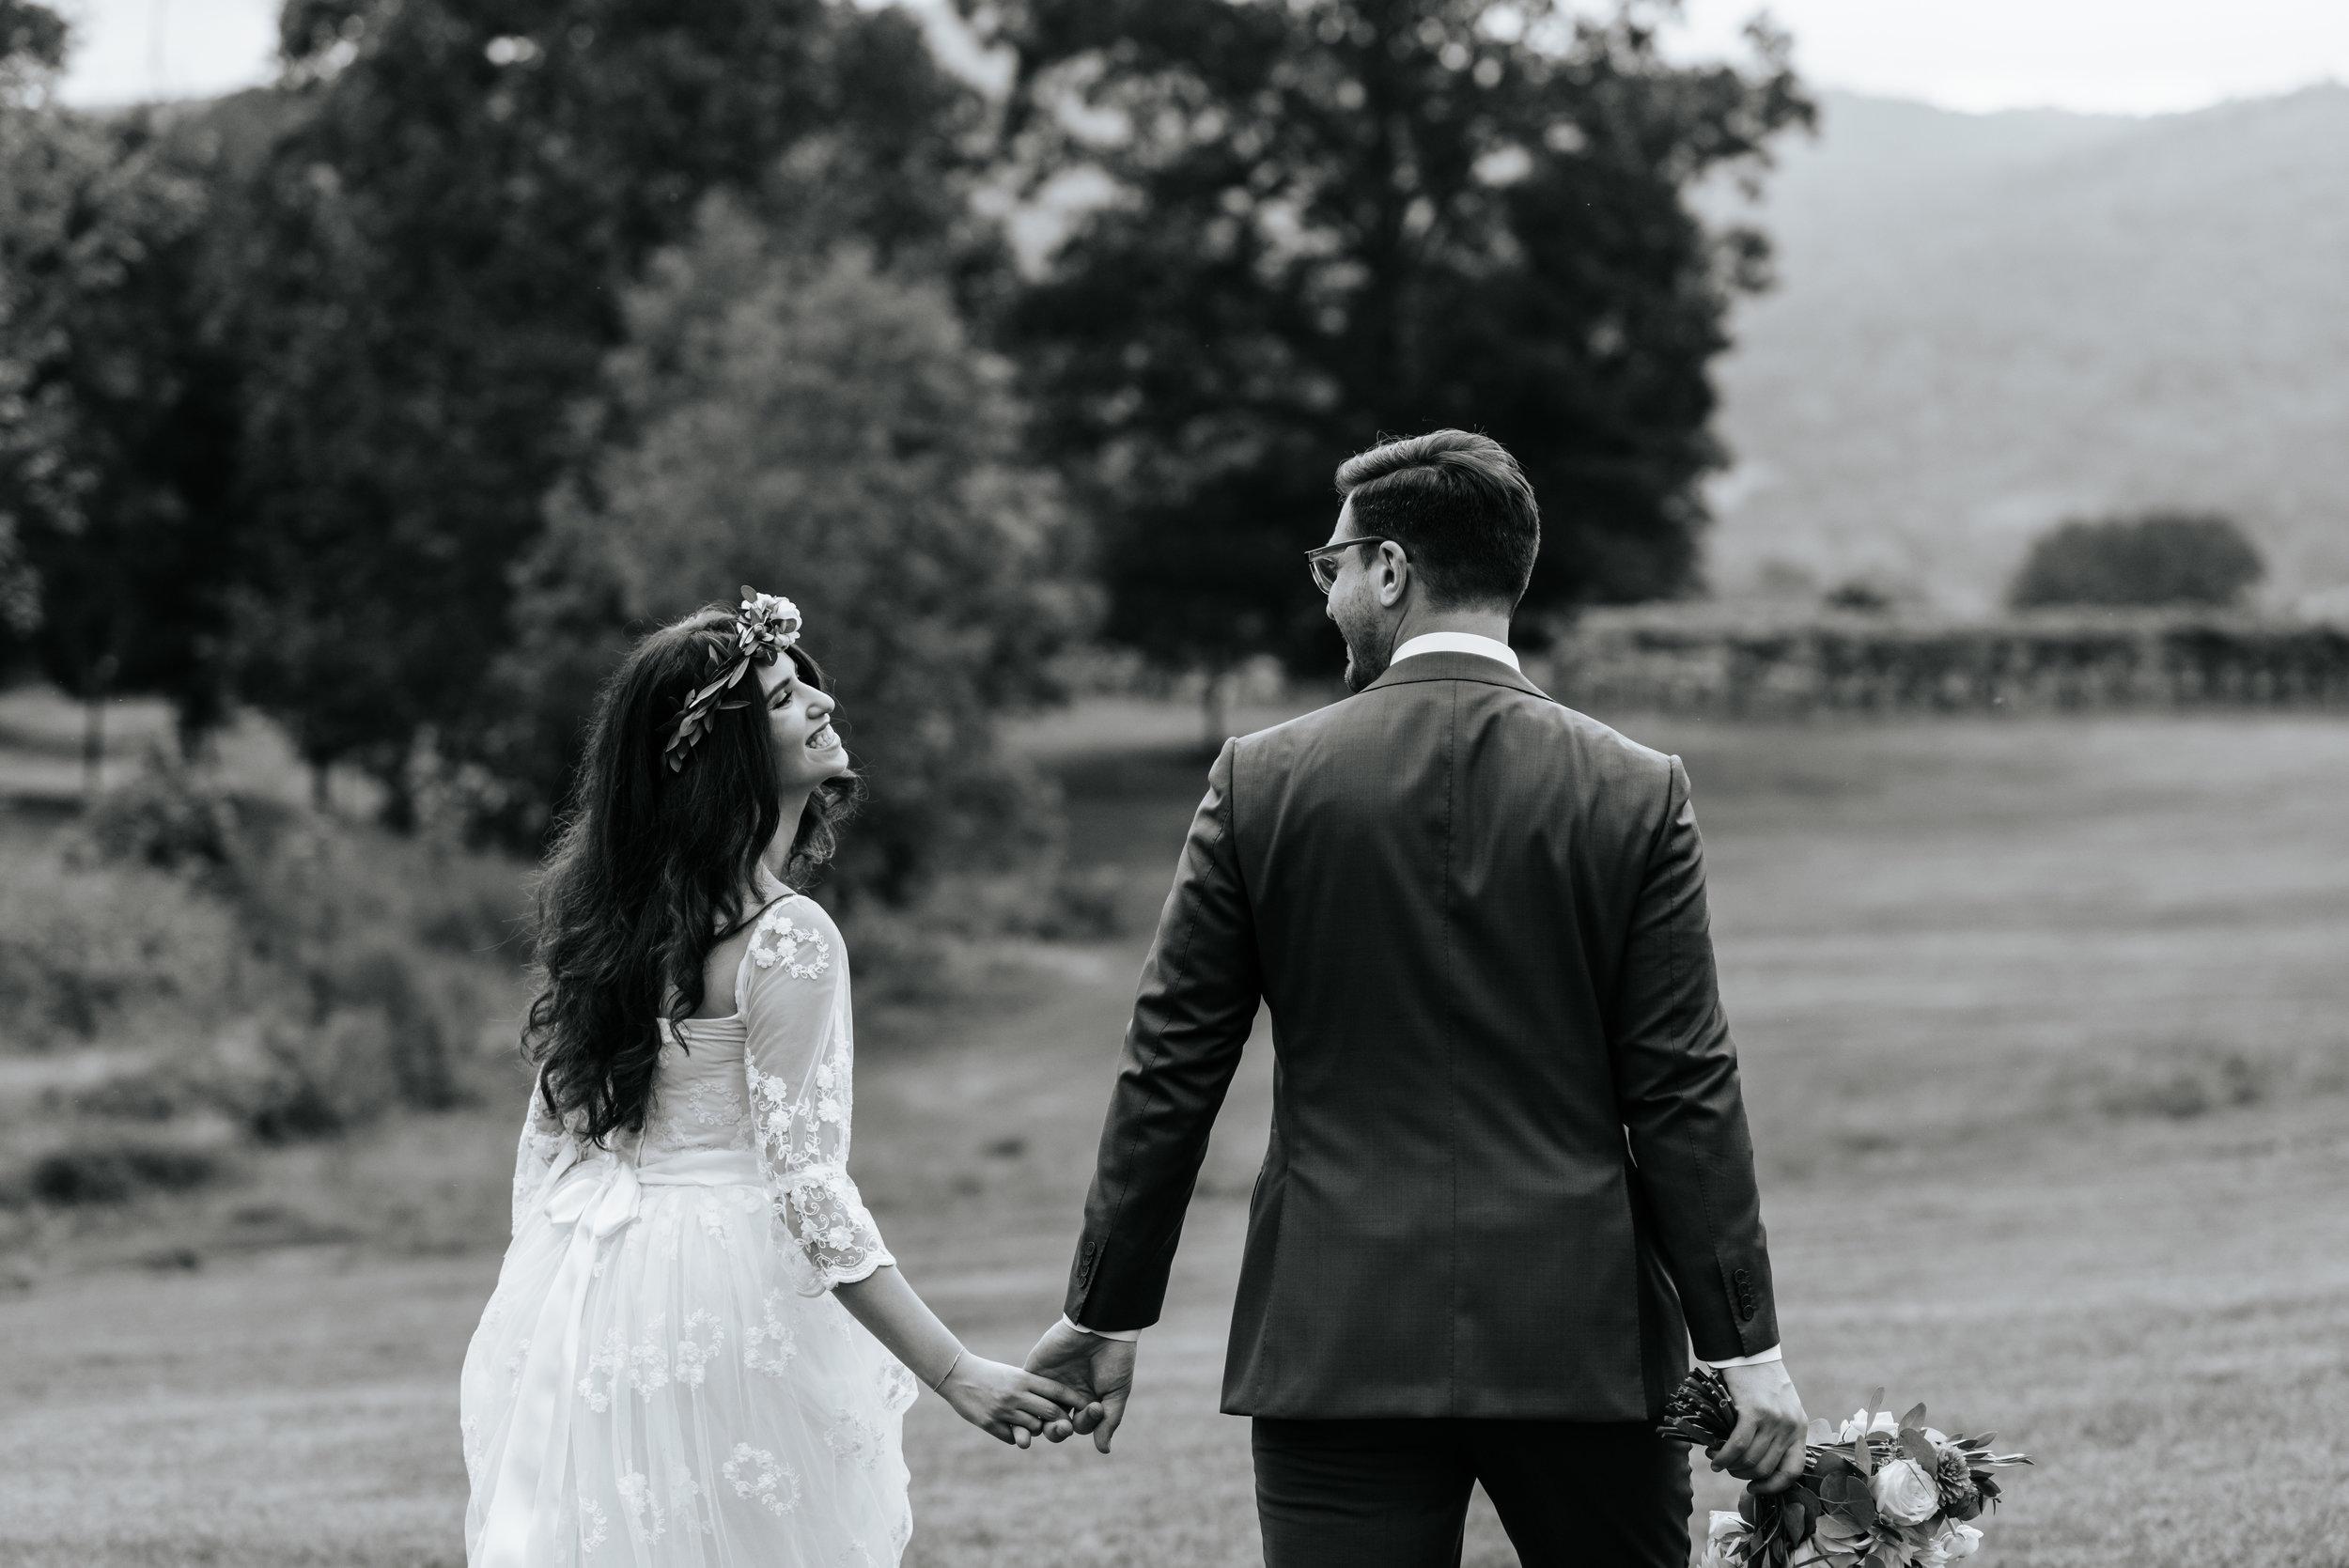 Veritas-Vineyards-and-Winery-Wedding-Photography-Afton-Virginia-Yasmin-Seth-Photography-by-V-2589.jpg